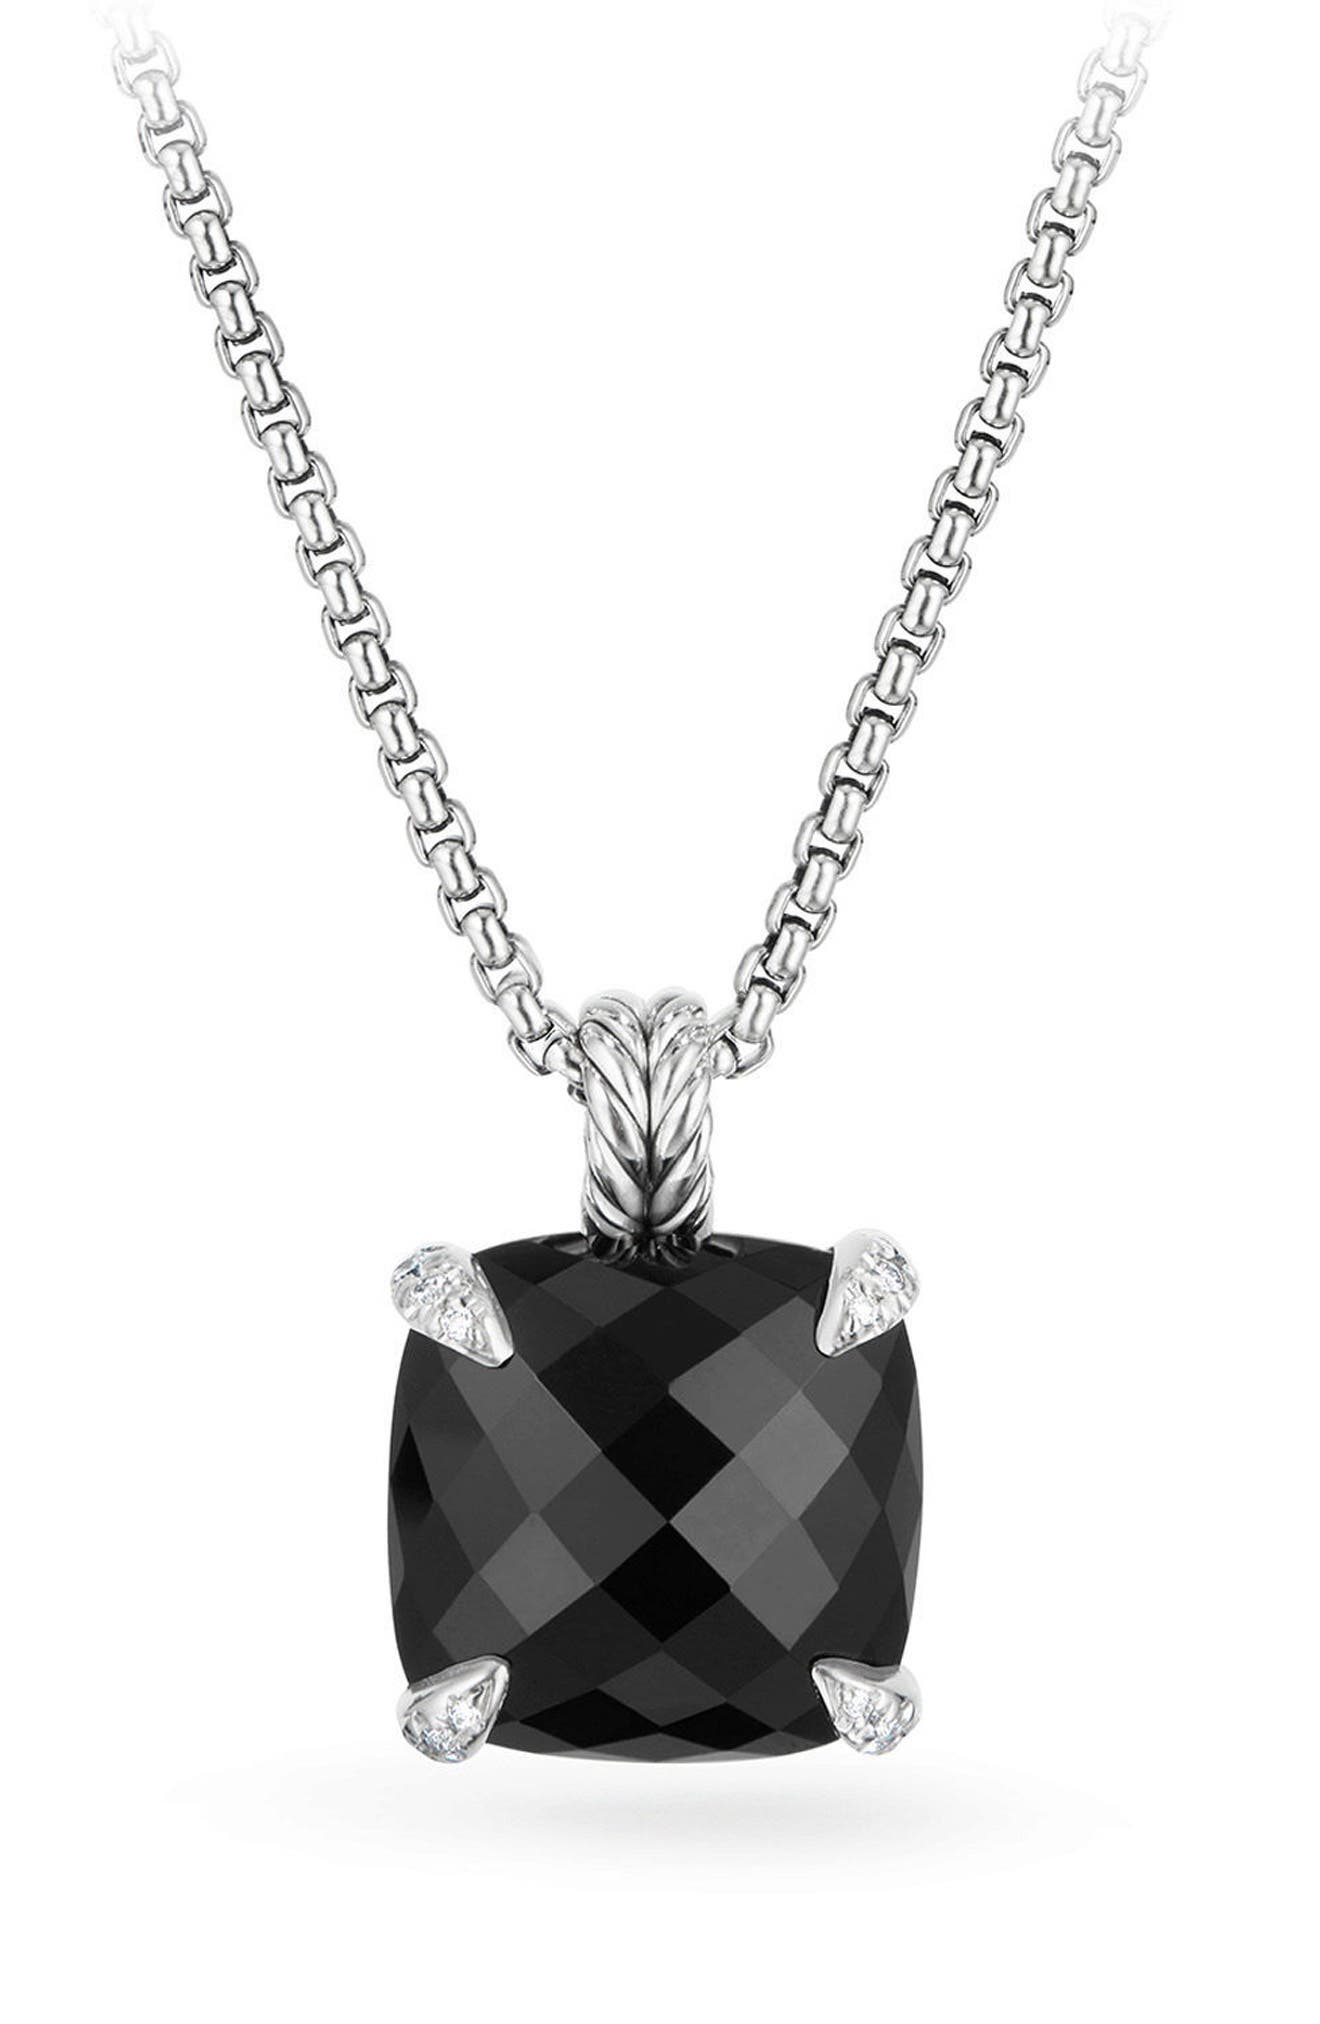 DAVID YURMAN Châtelaine Pendant Necklace with Diamonds, Main, color, BLACK ONYX?